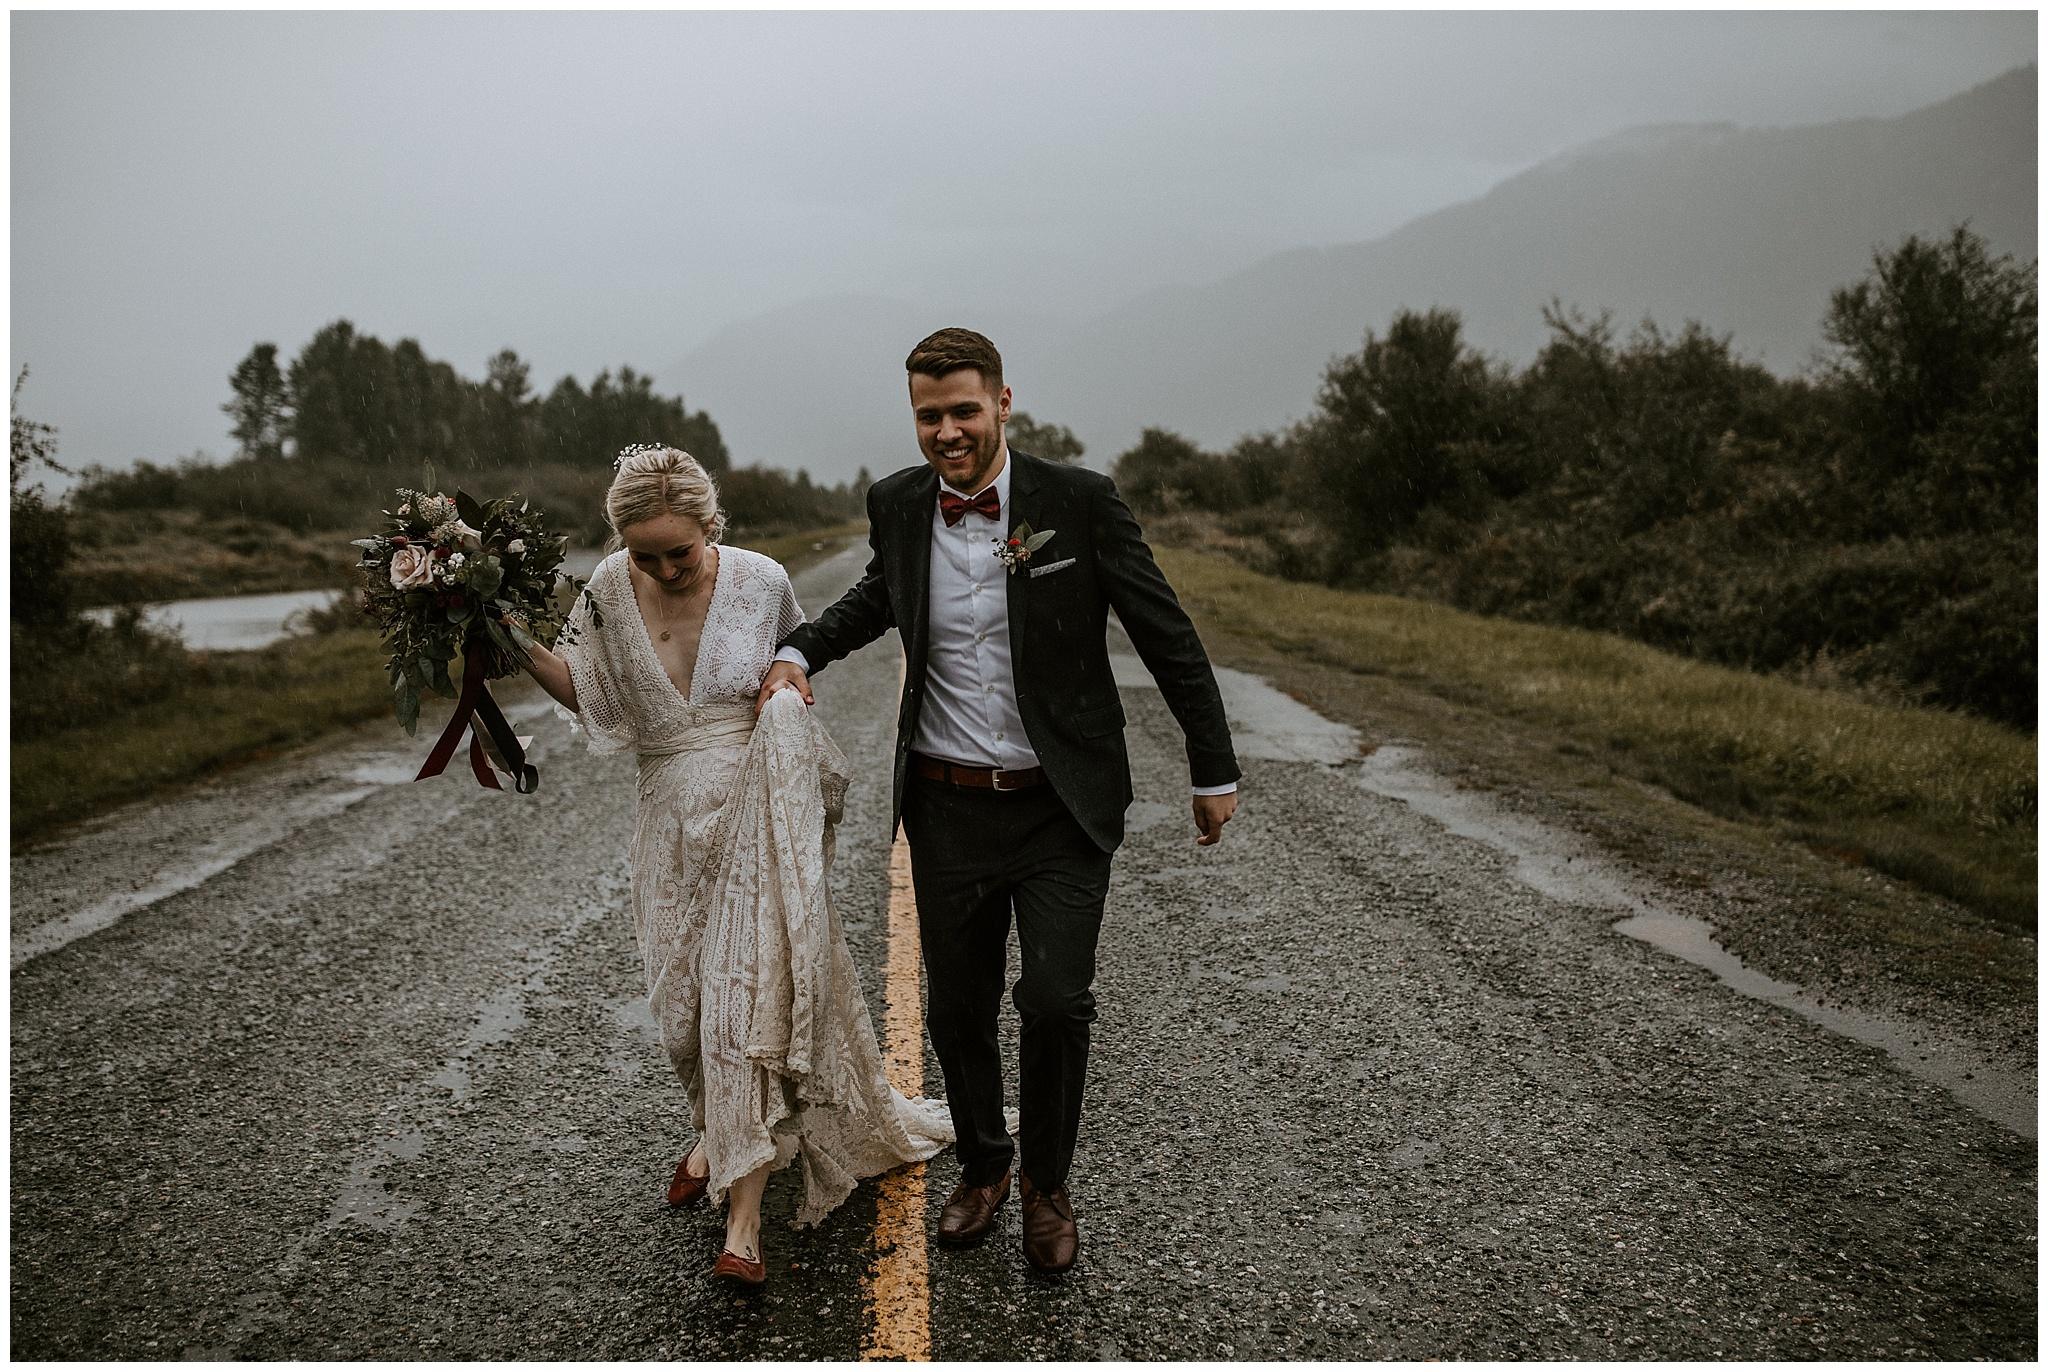 pitt-lake-advenutre-elopement-british-columbia-034.JPG